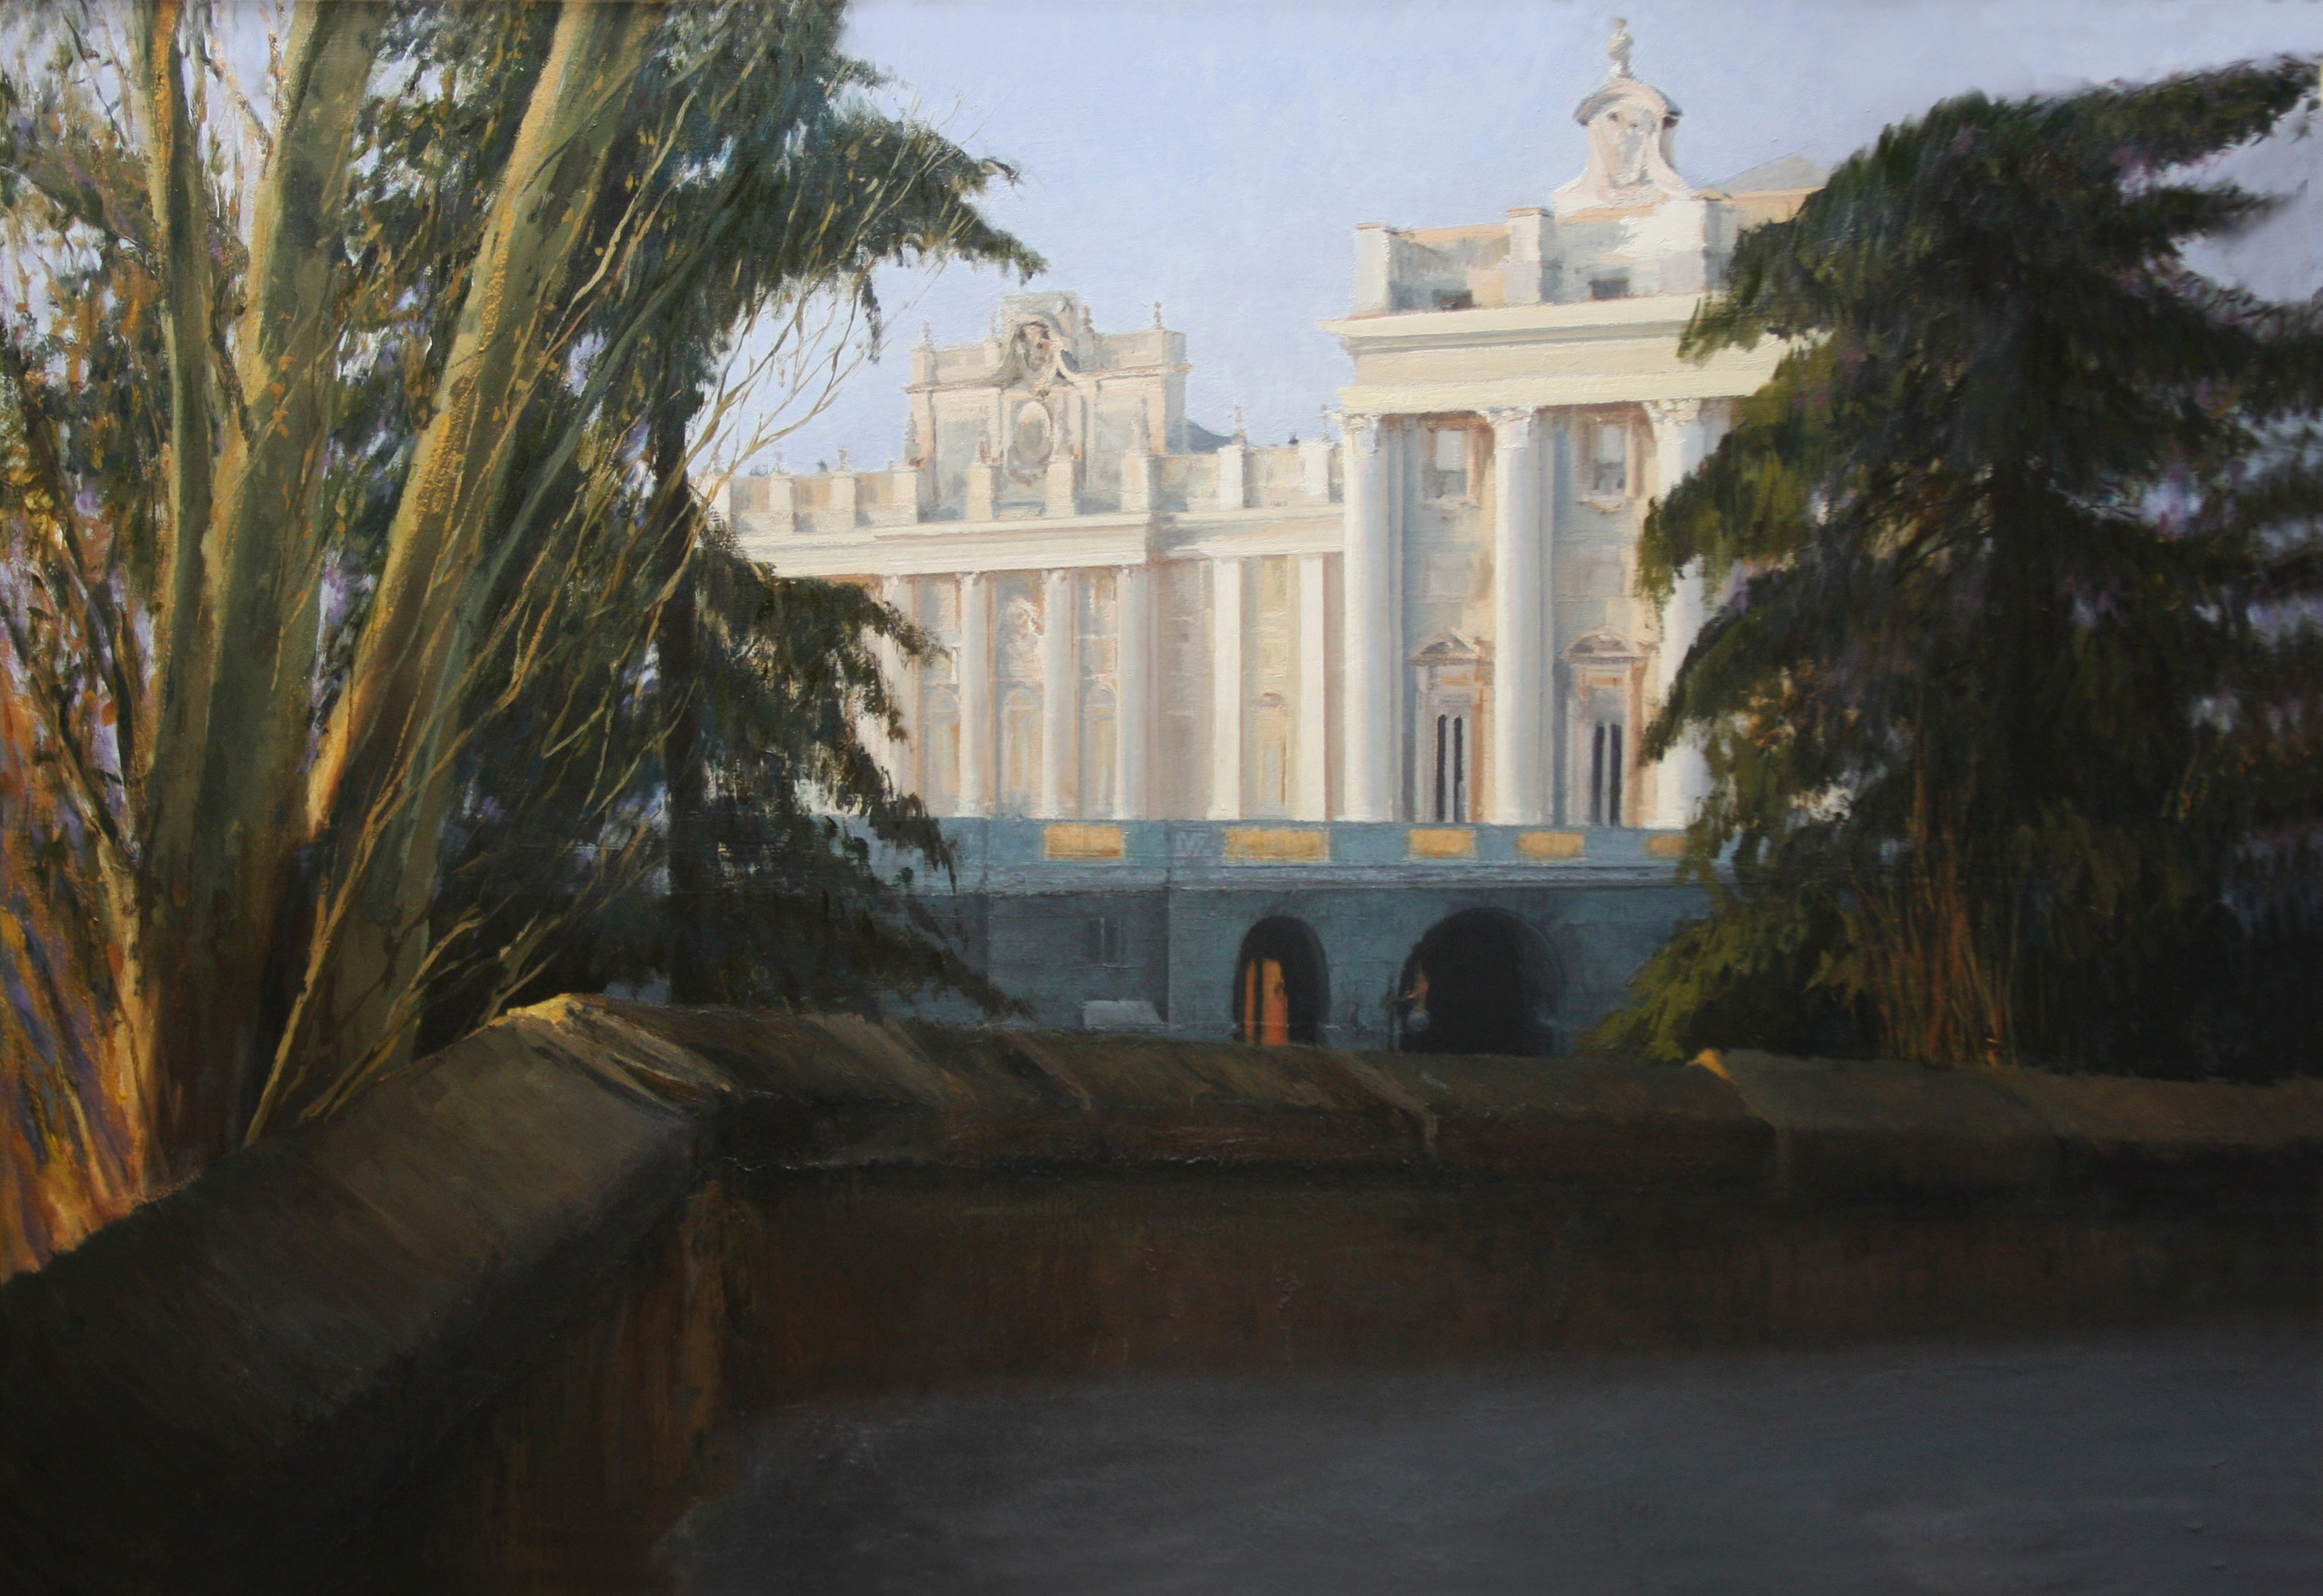 PalacioRealMadrid.baja